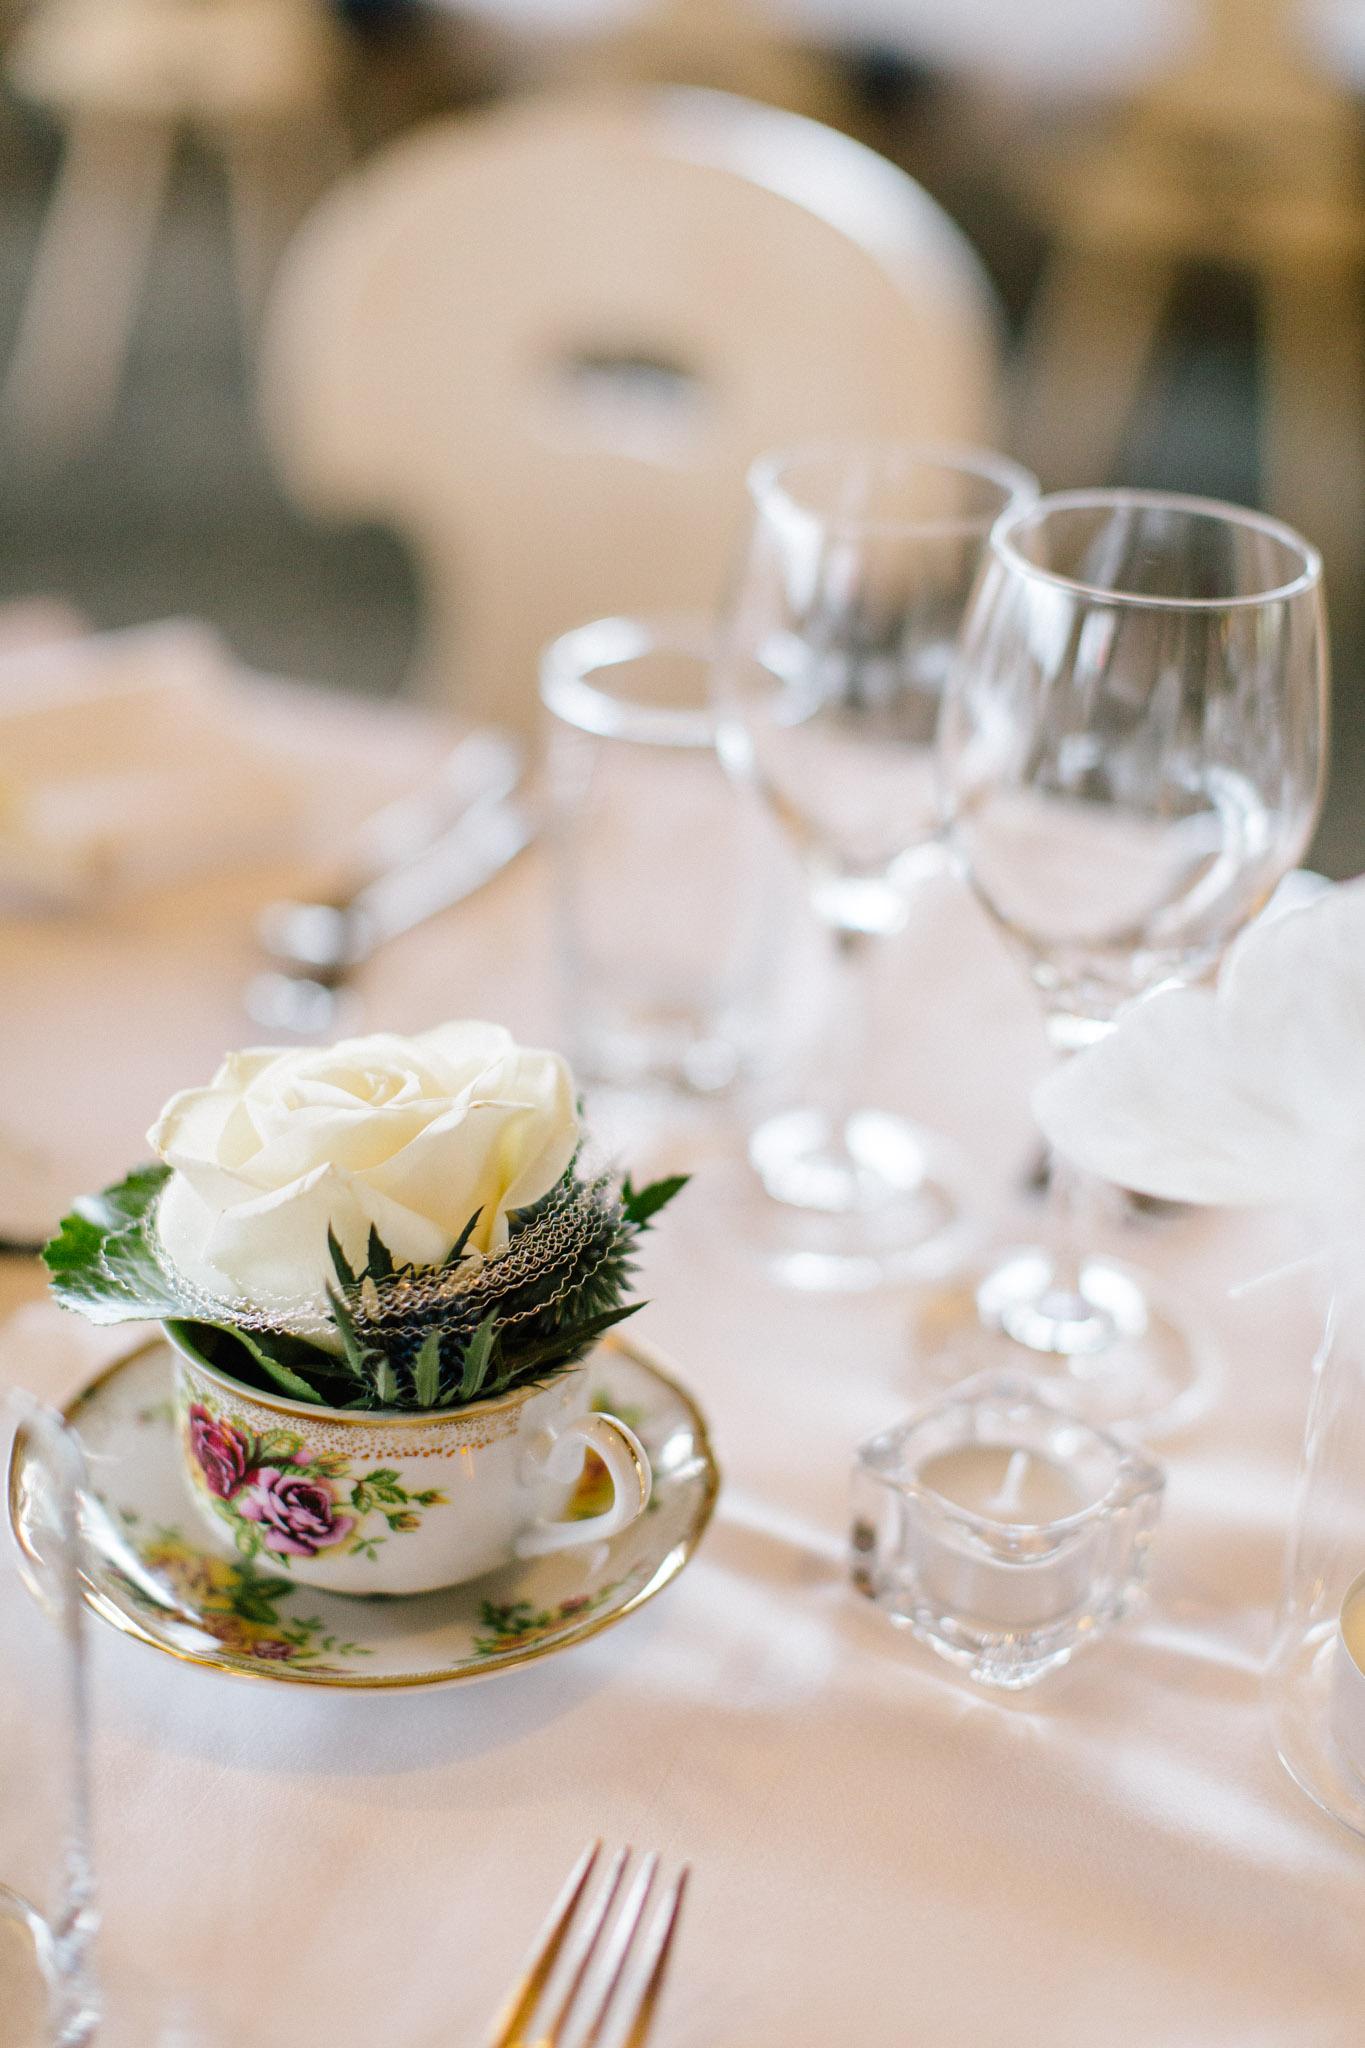 Lenl-Simmental-Buehlerhof-Pia-Anna-Christian-Wedding-Photography-EK-64.jpg